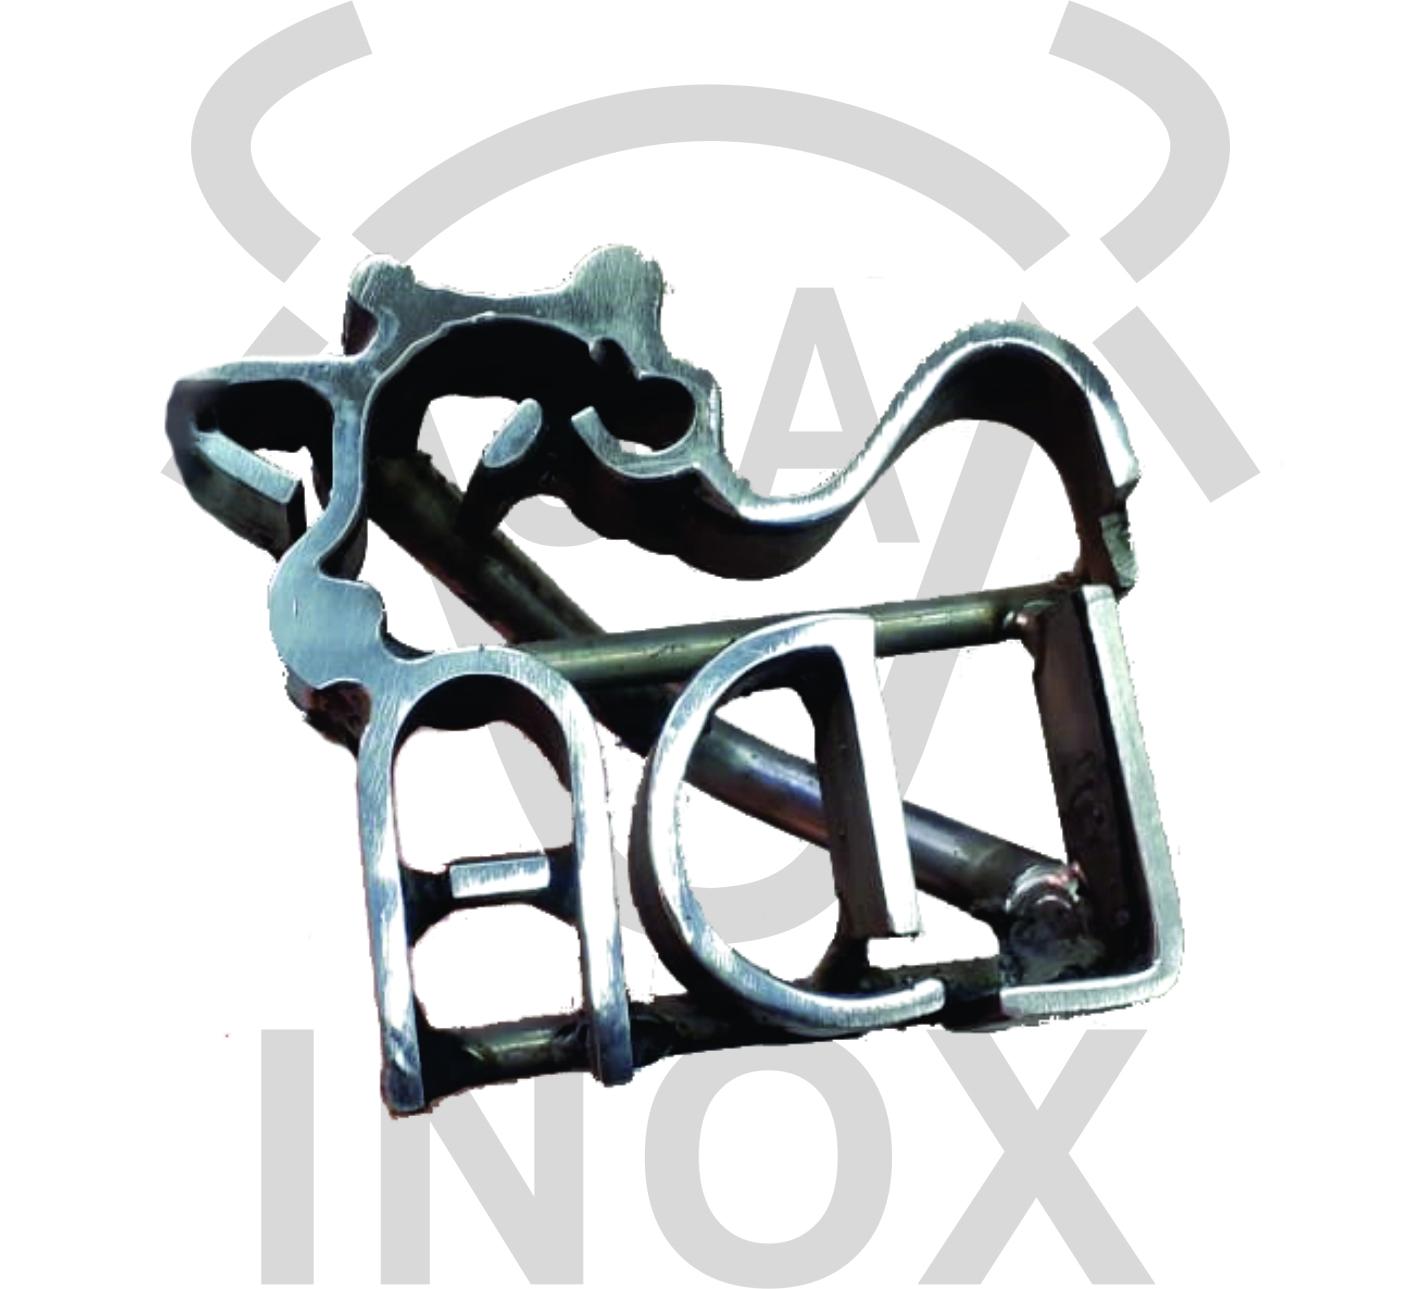 J.A INOX - MARCAS EM INOX